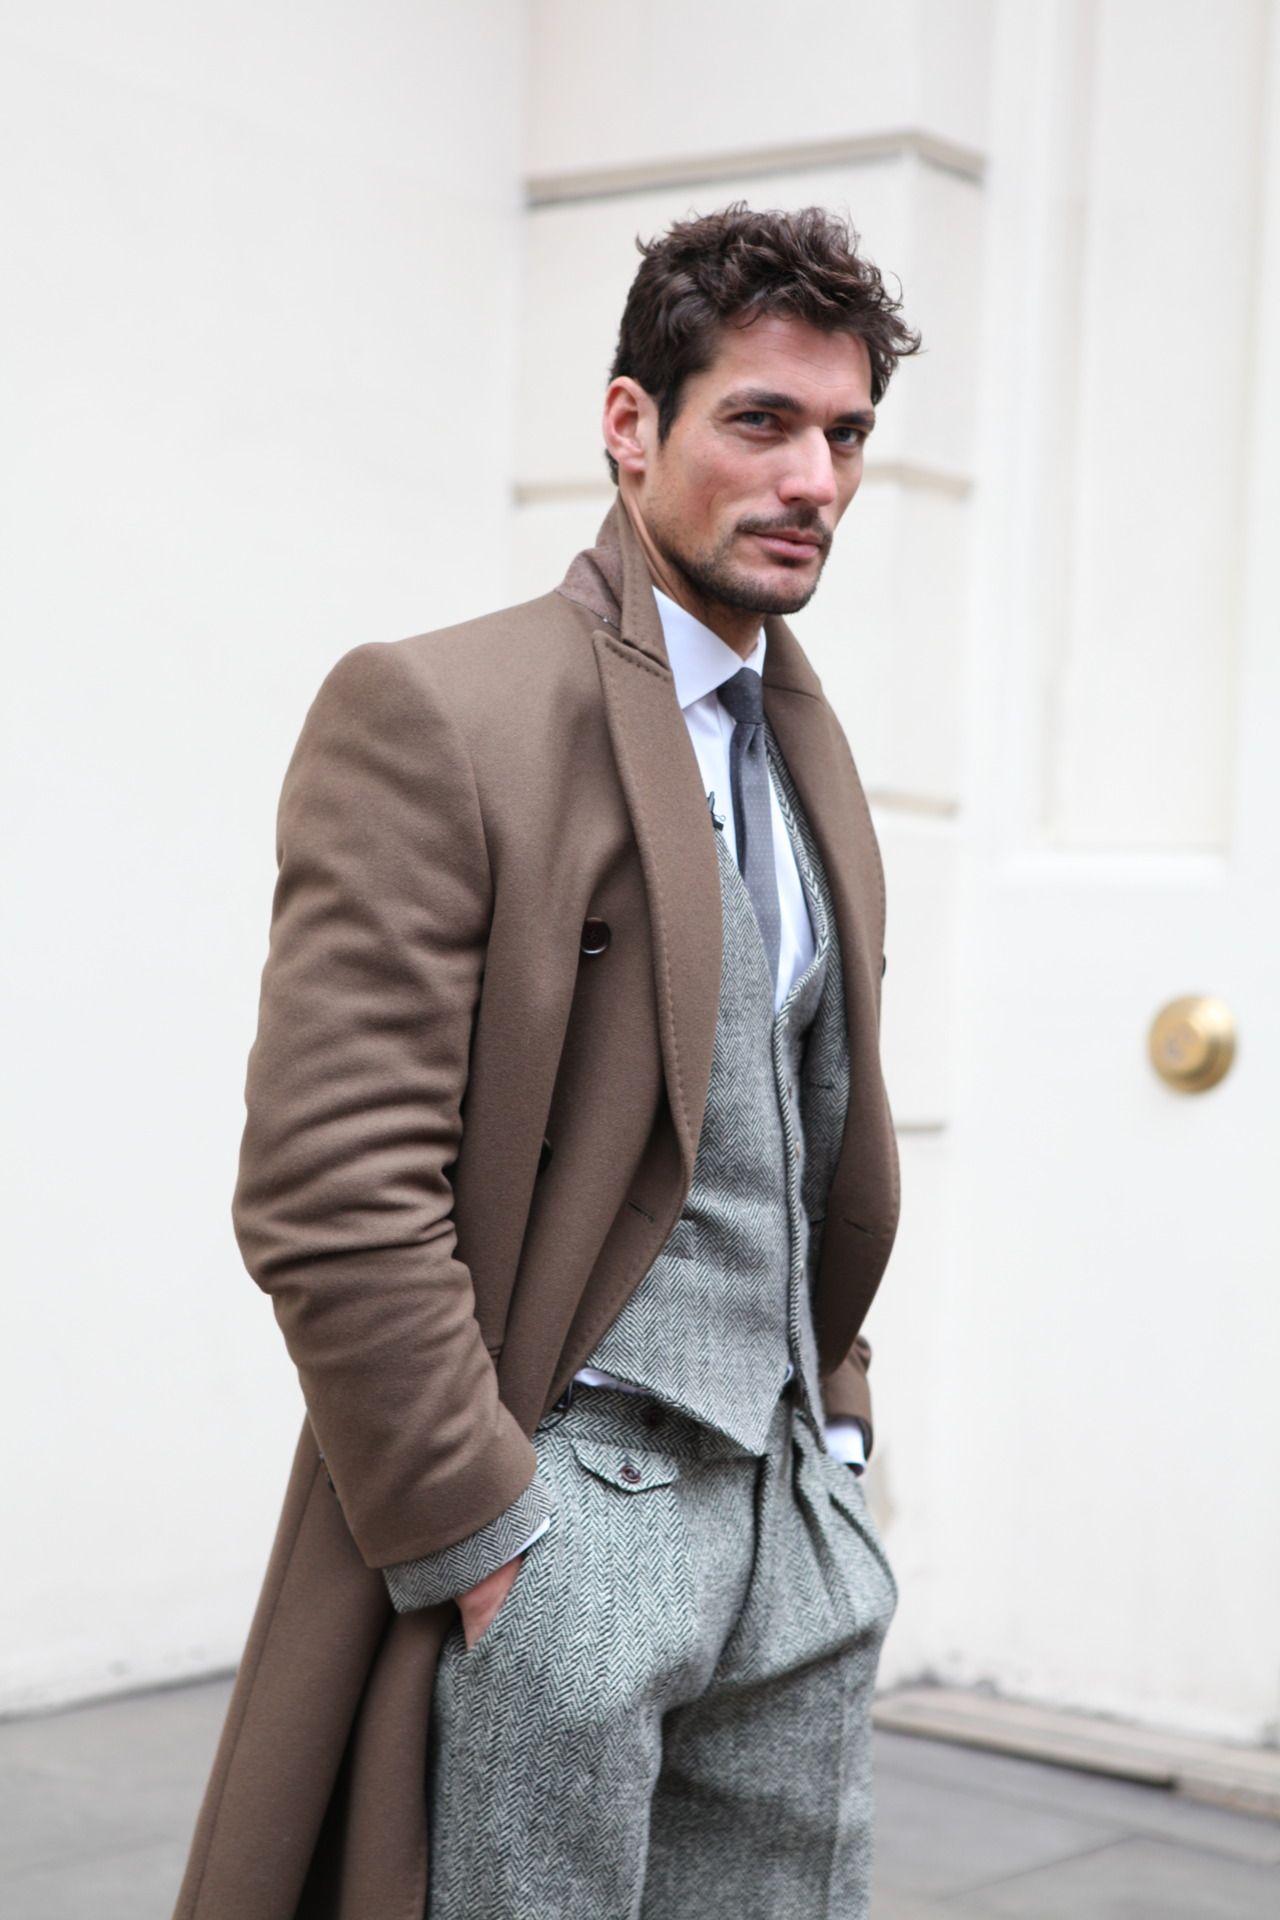 Menus styles menus fashion uc love men in suits pinterest